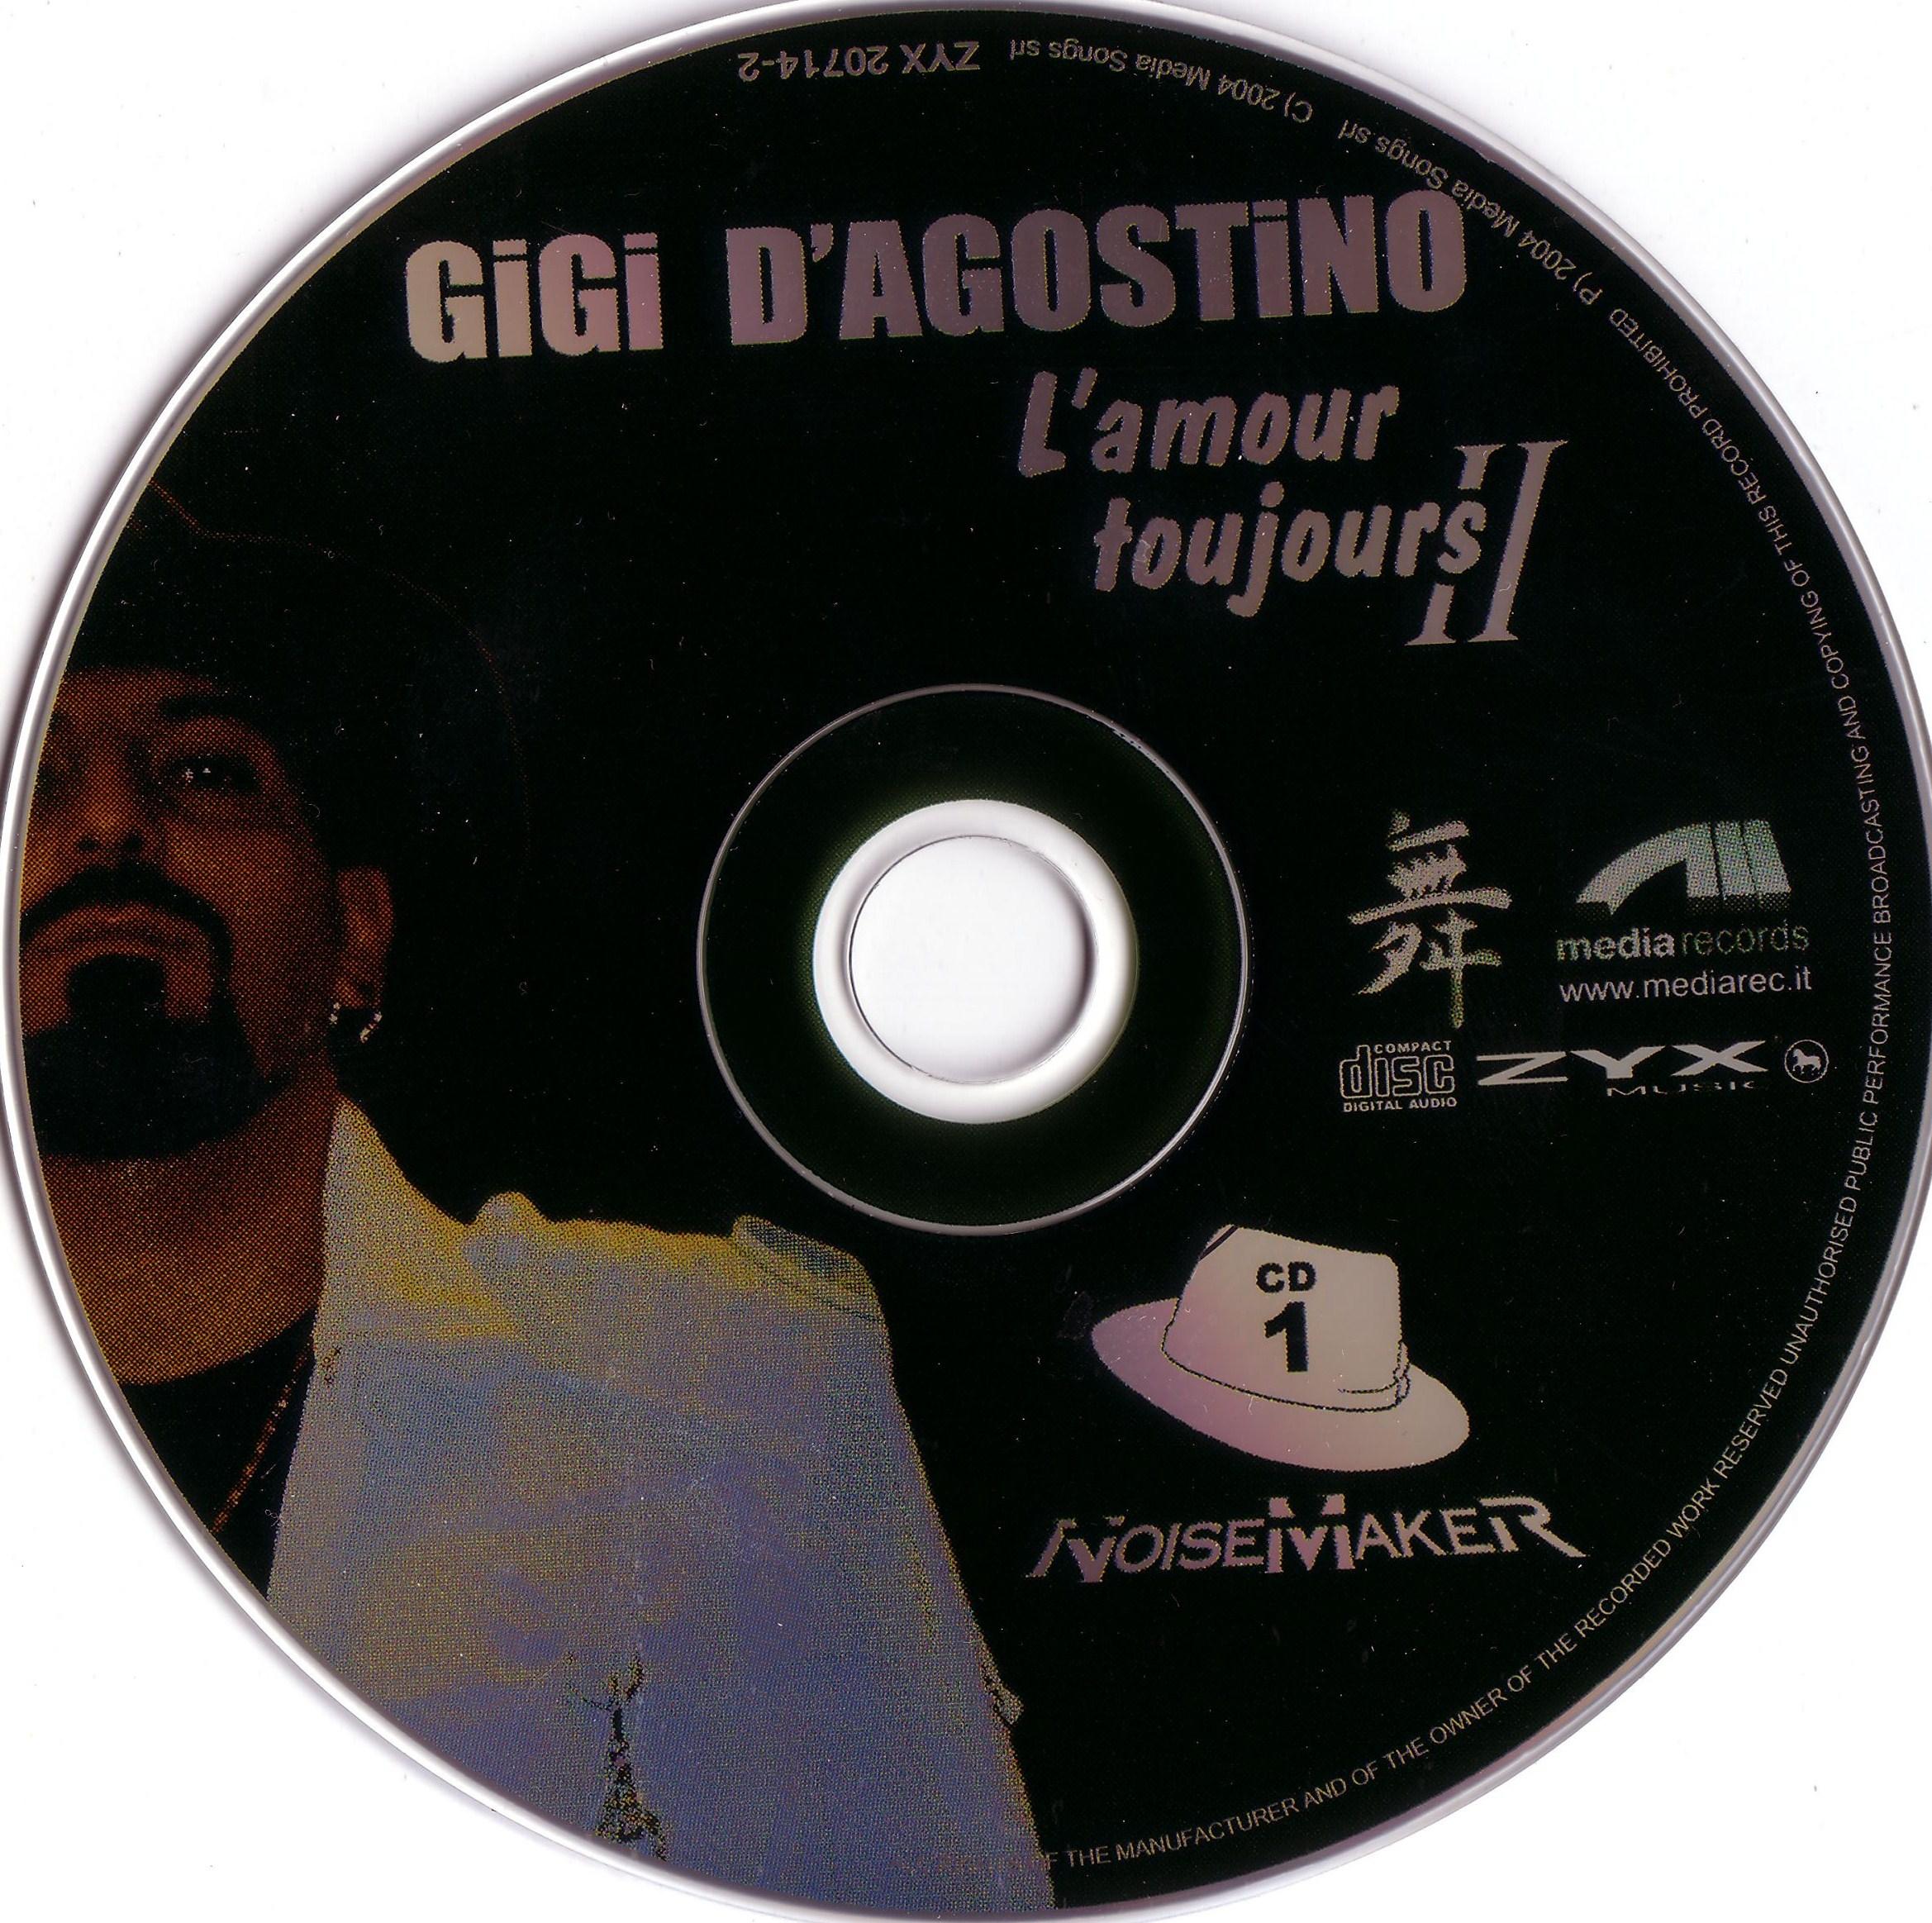 Gigi d agostino l amour toujours lyrics